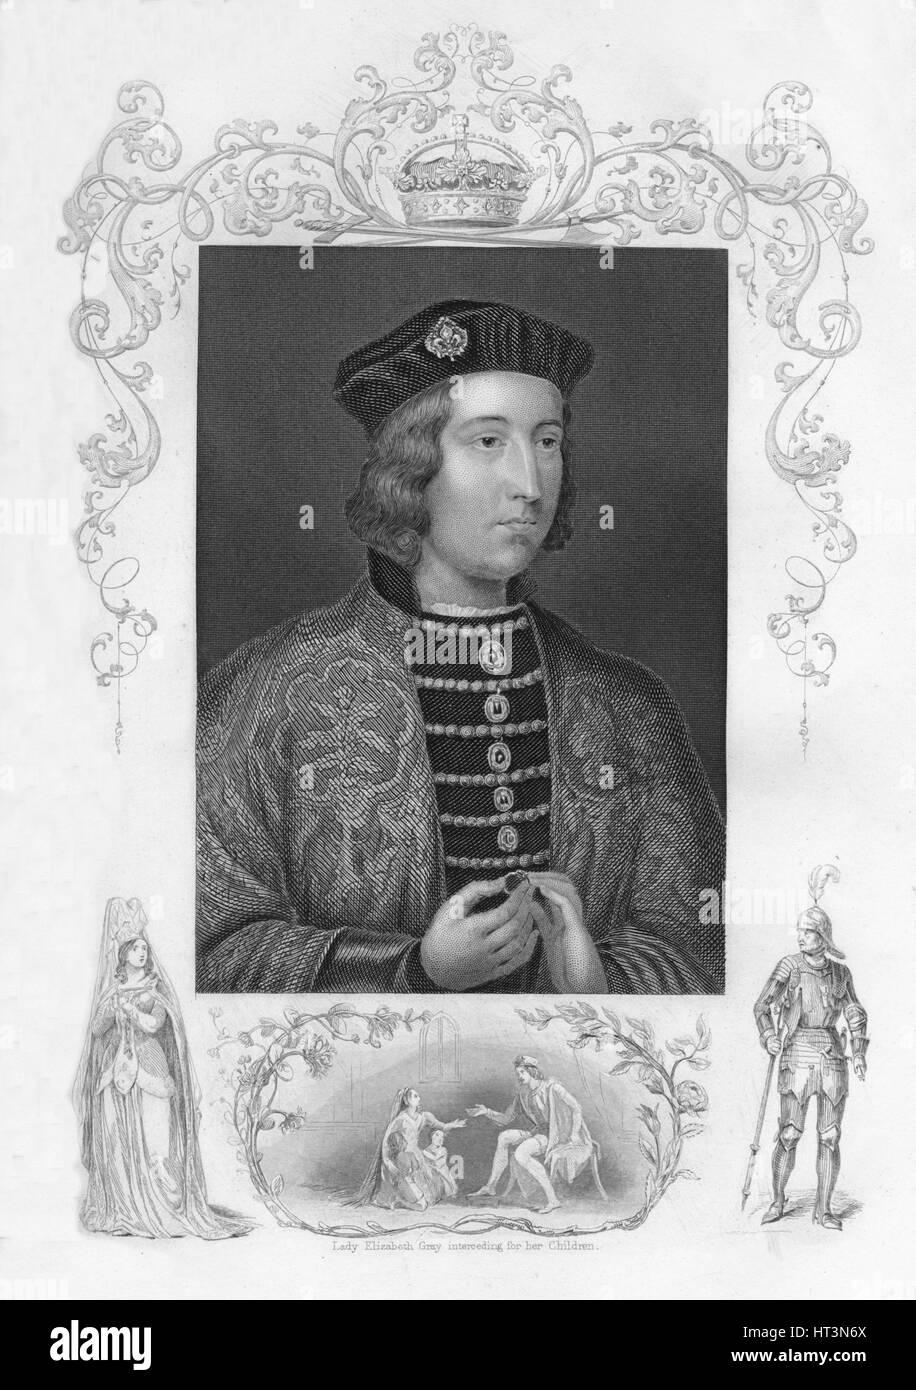 'Edward IV', 1859. Artist: George Vertue. - Stock Image